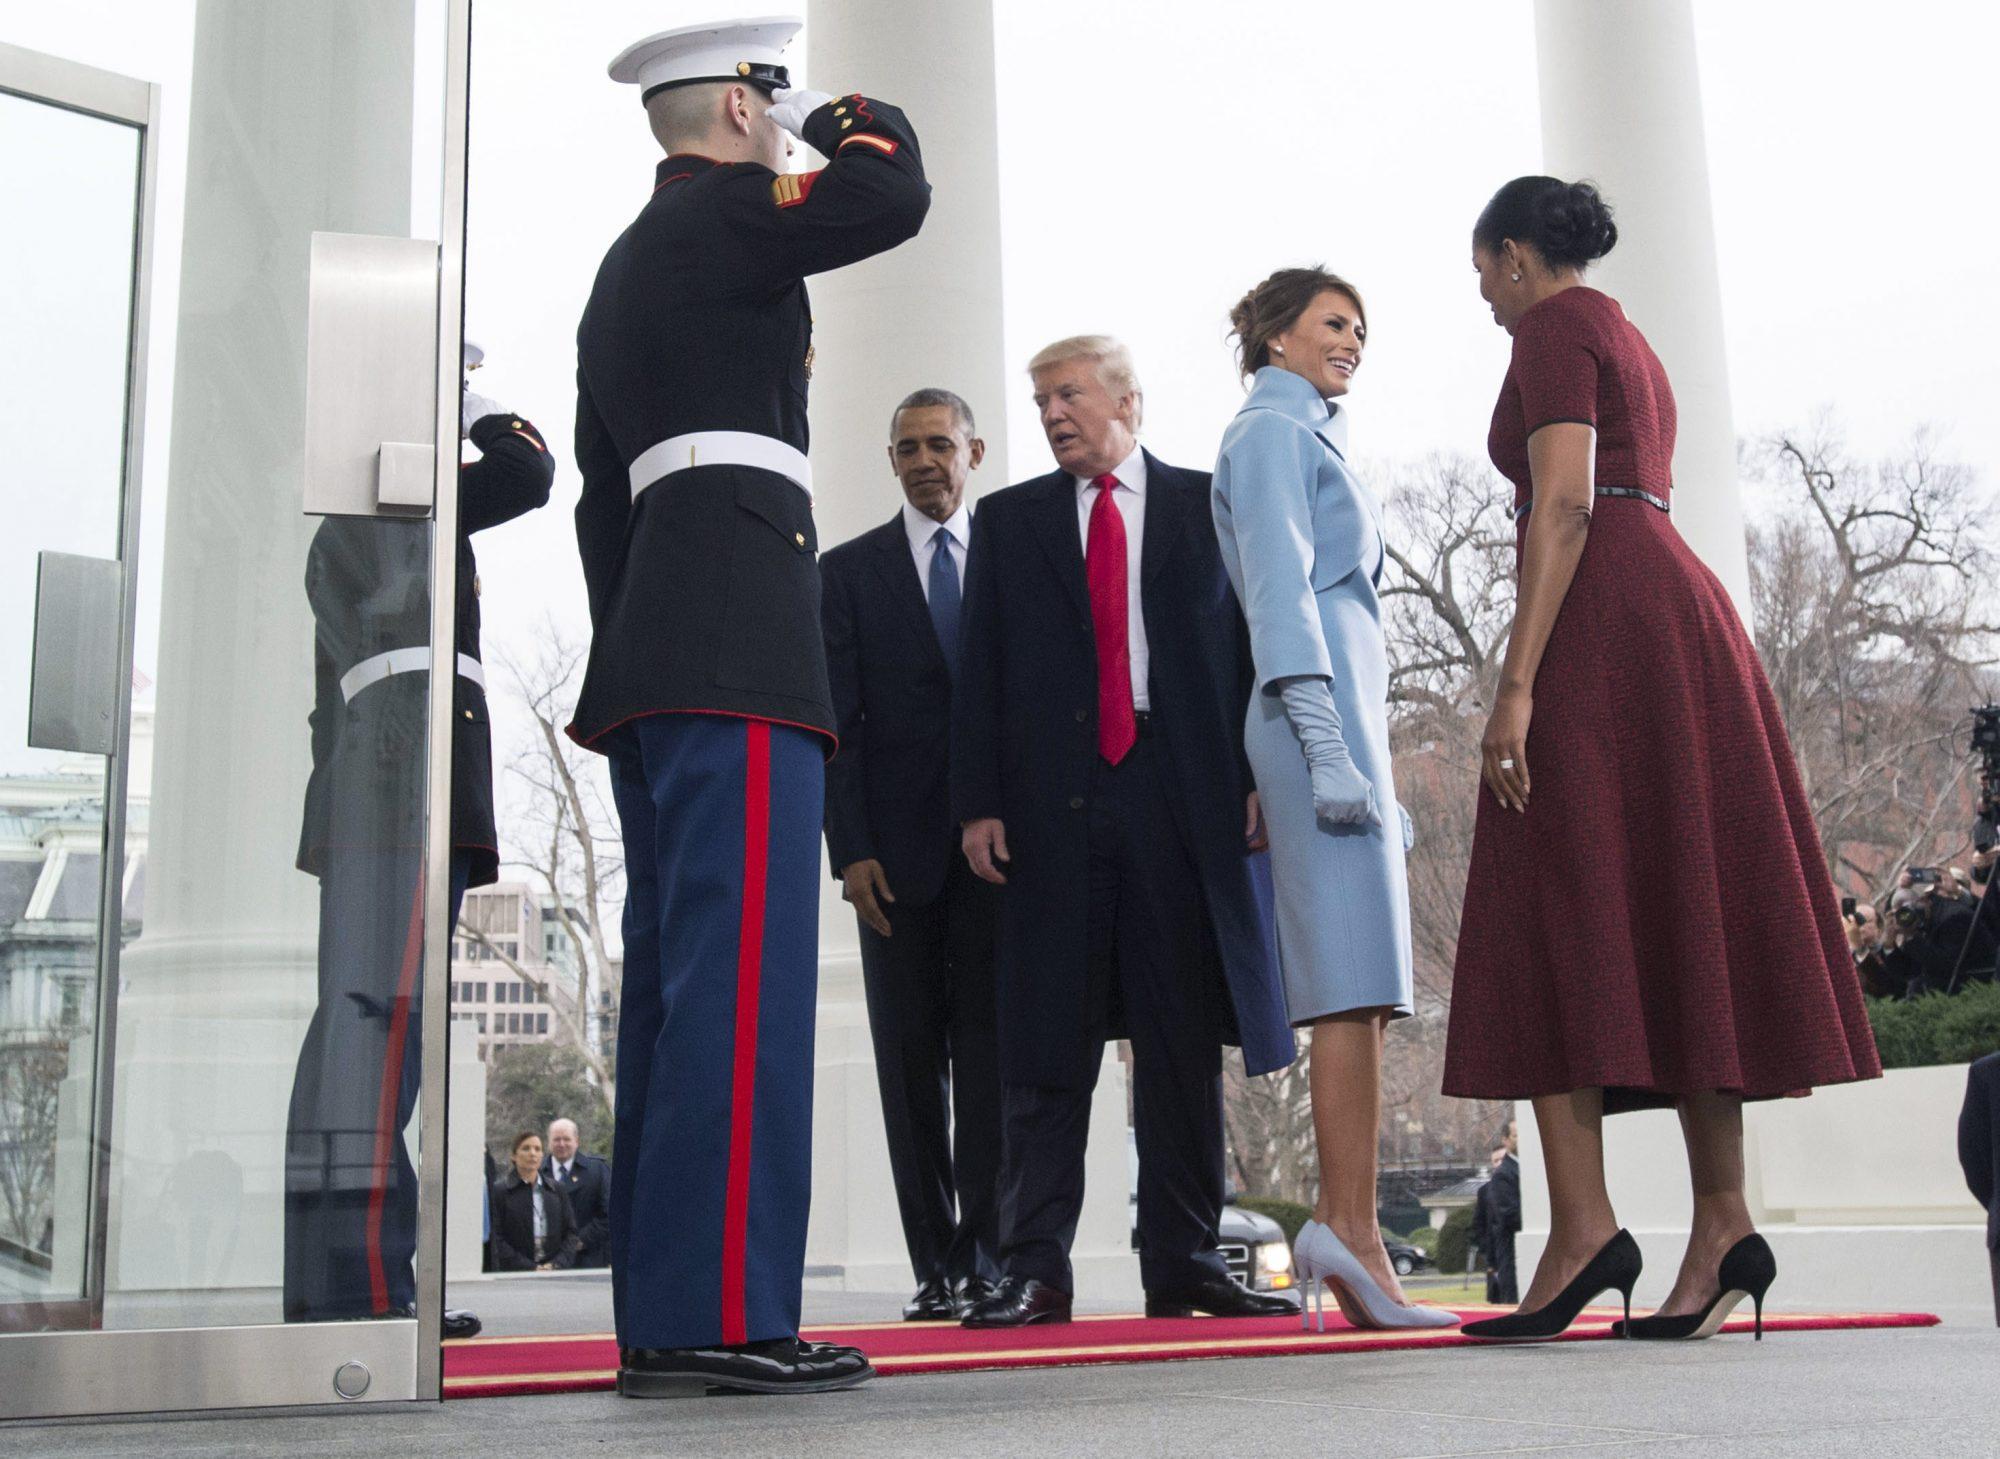 Inauguración presidencial de Donald Trump